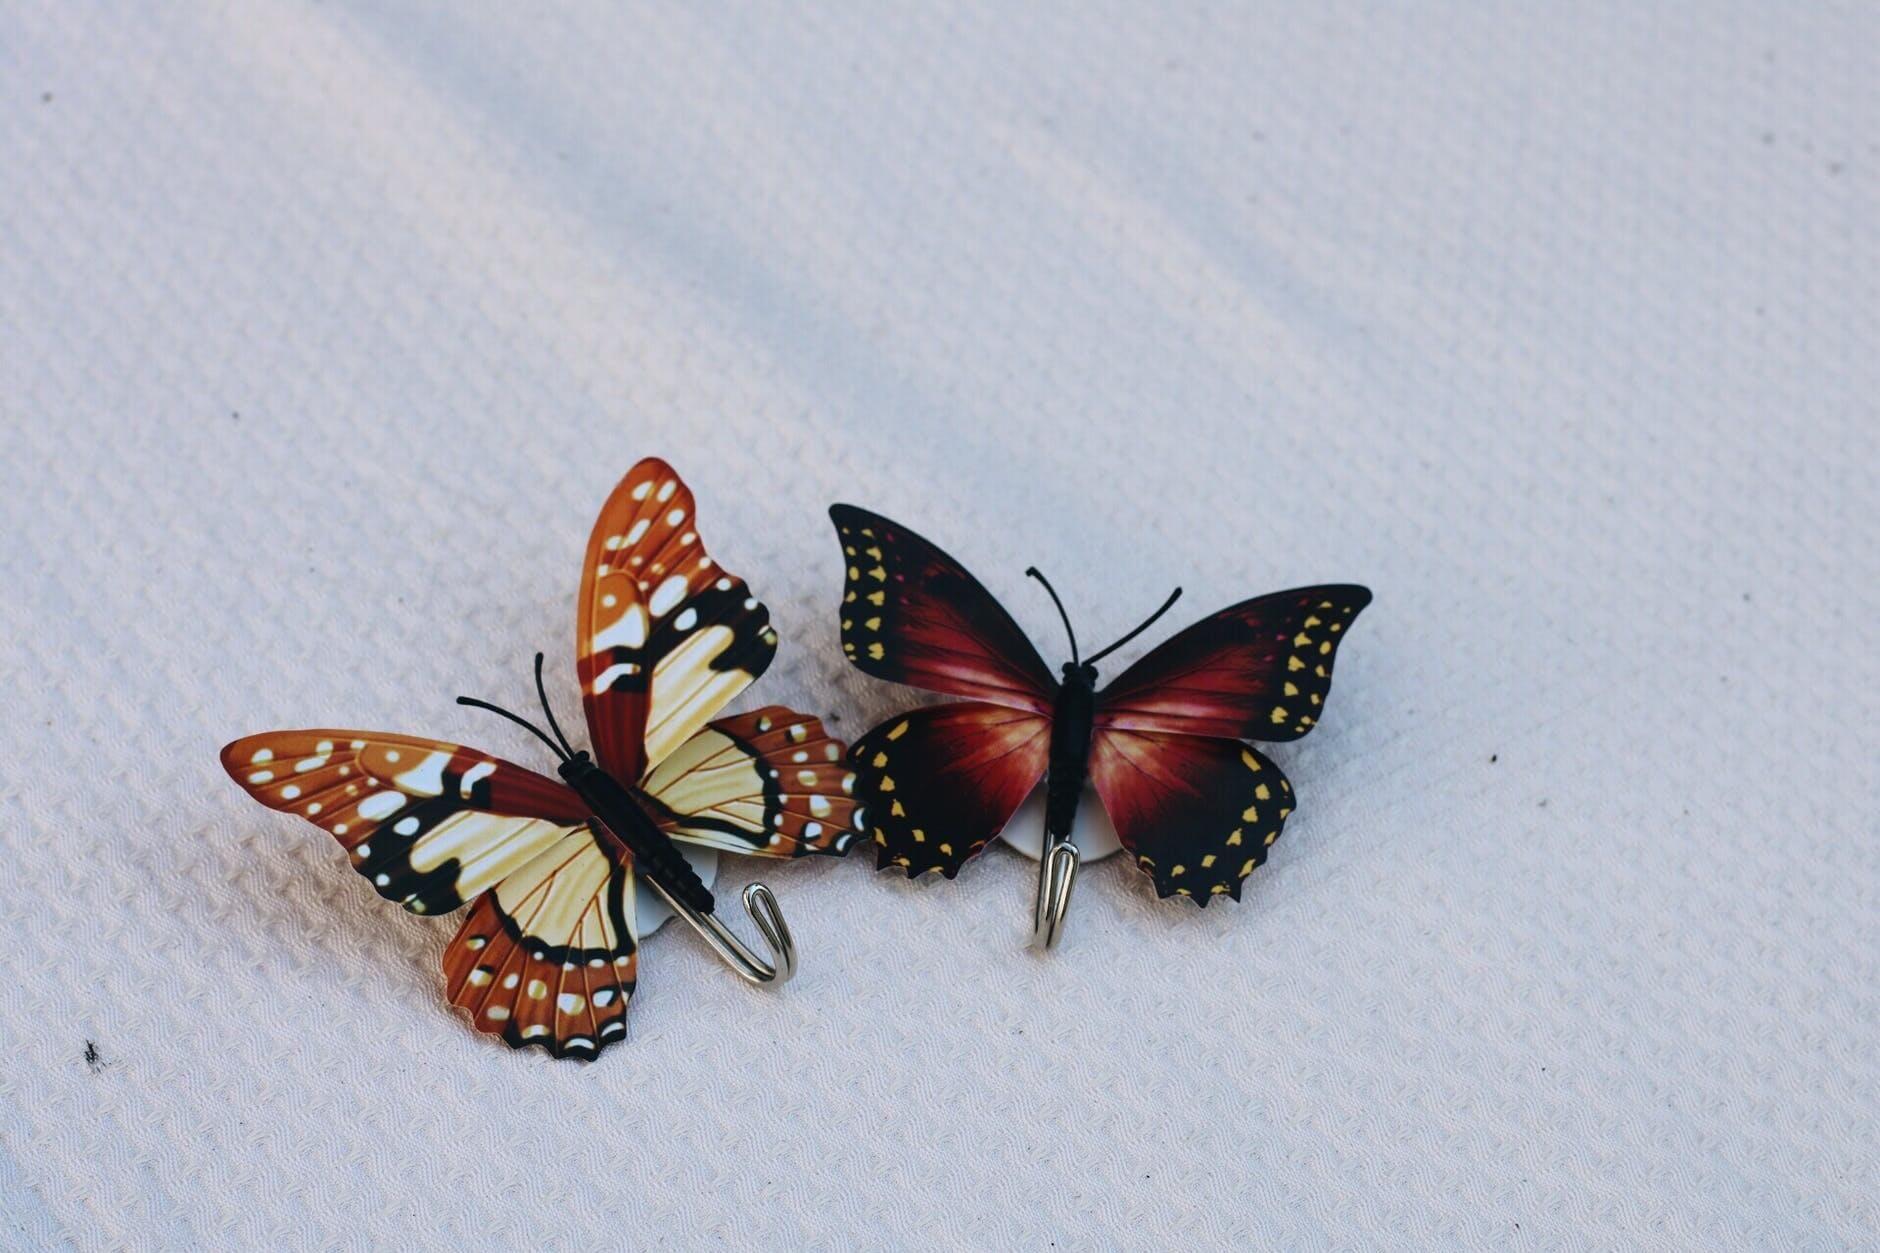 Hd Nice Color Butterfly Desktop Wallpapers Full Screen In 2020 Butterfly Photos Beautiful Butterfly Images Beautiful Butterfly Pictures